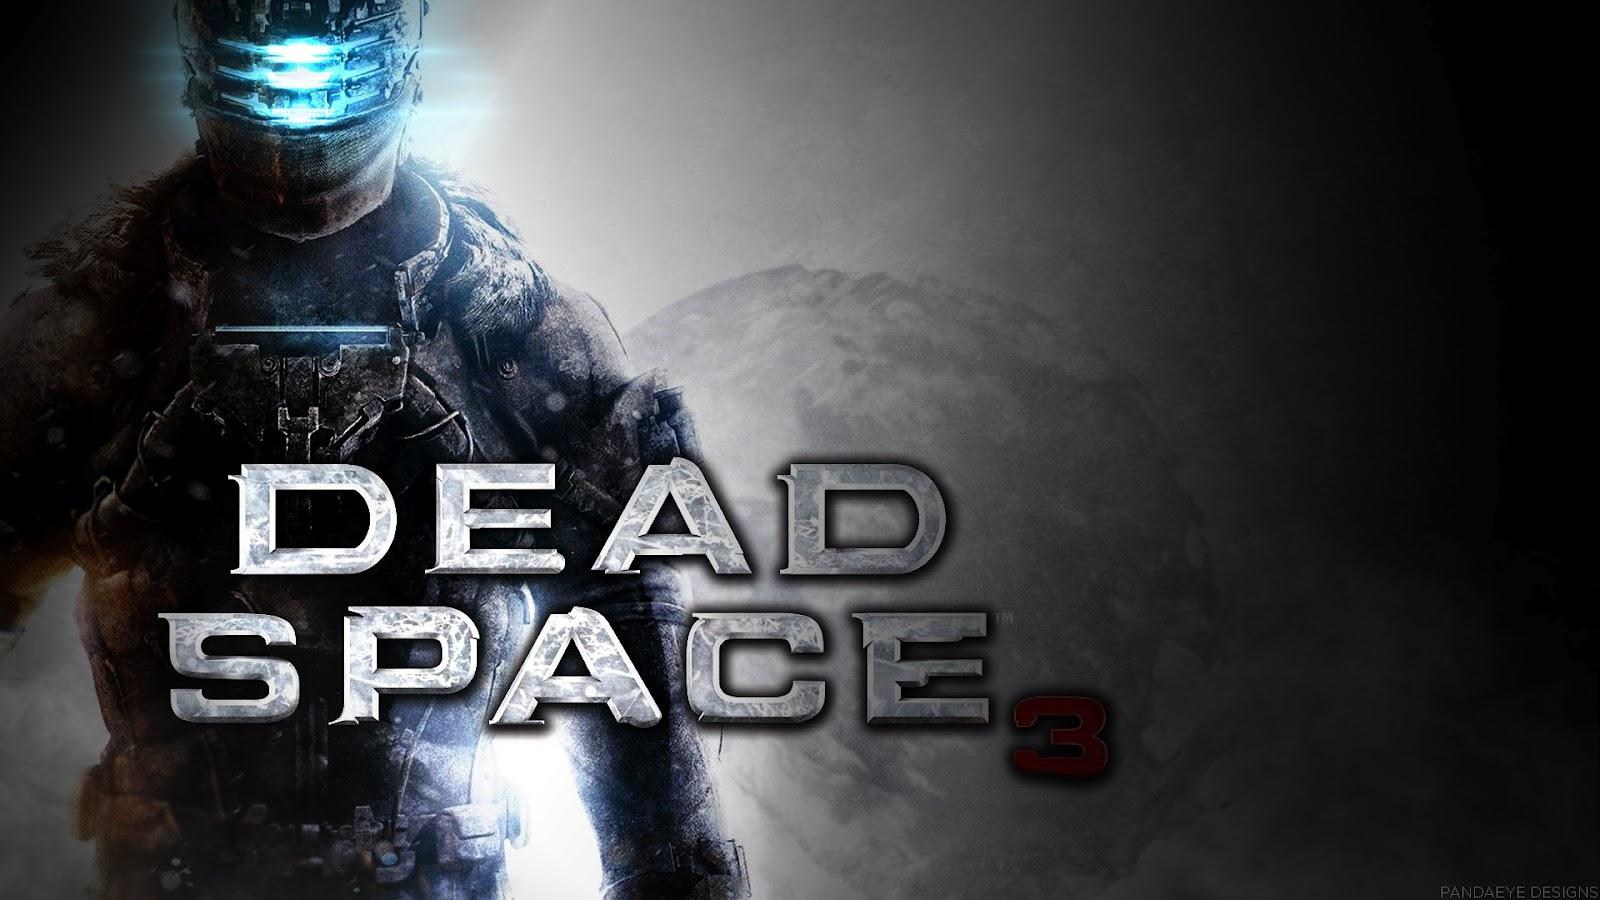 http://2.bp.blogspot.com/-ysgfdmbsvDo/UESBxQ0fGXI/AAAAAAAAAnw/RBlBuQsNw1c/s1600/dead_space_3_hd_wallpaper+PiCsHoliC.blogspot.com.jpg